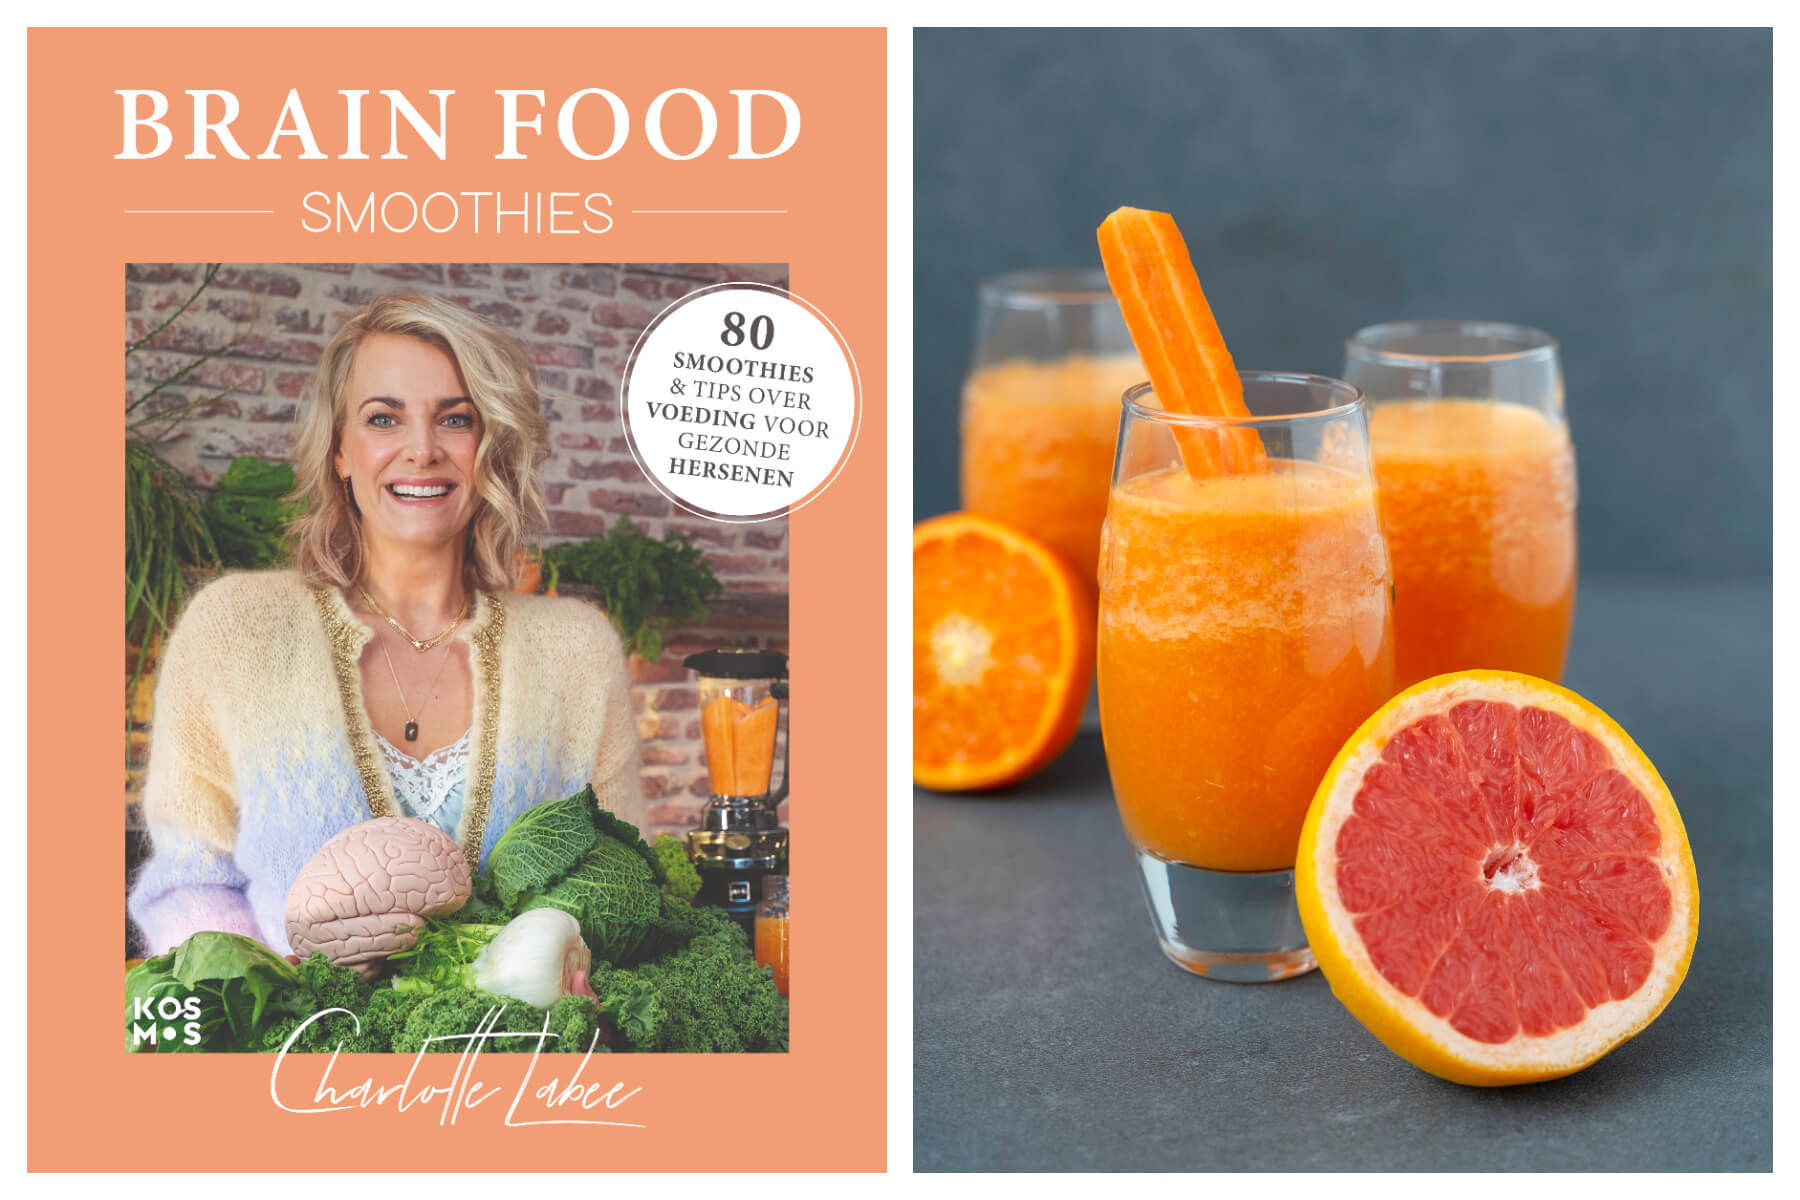 Brain Food Smoothies: Orange Smoothie